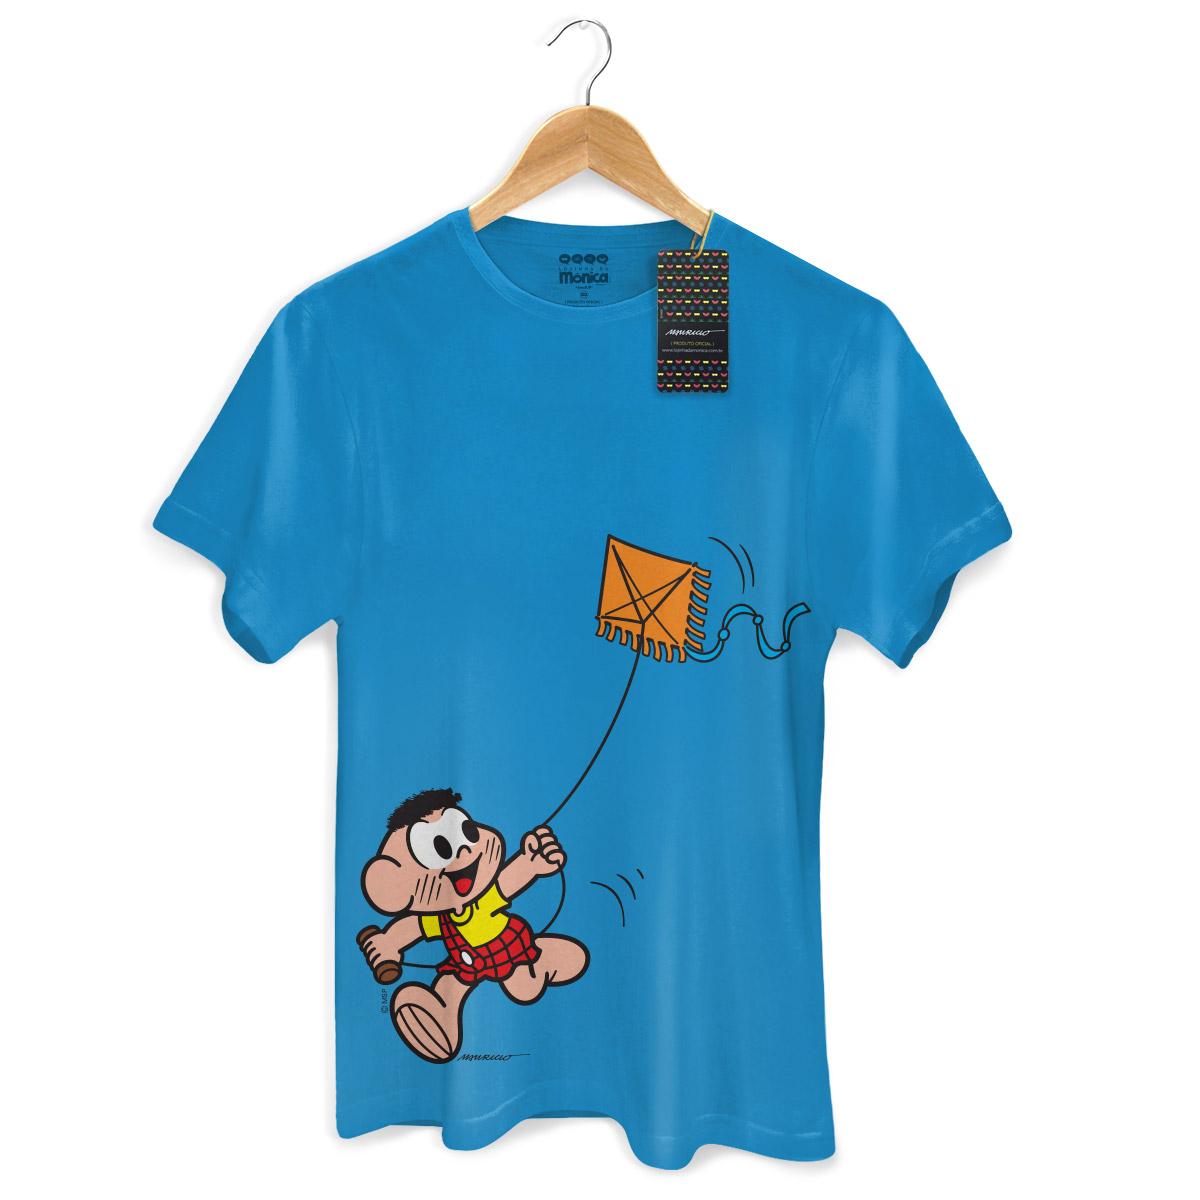 Camiseta Masculina Turma da M�nica Kids Casc�o Soltando Pipa